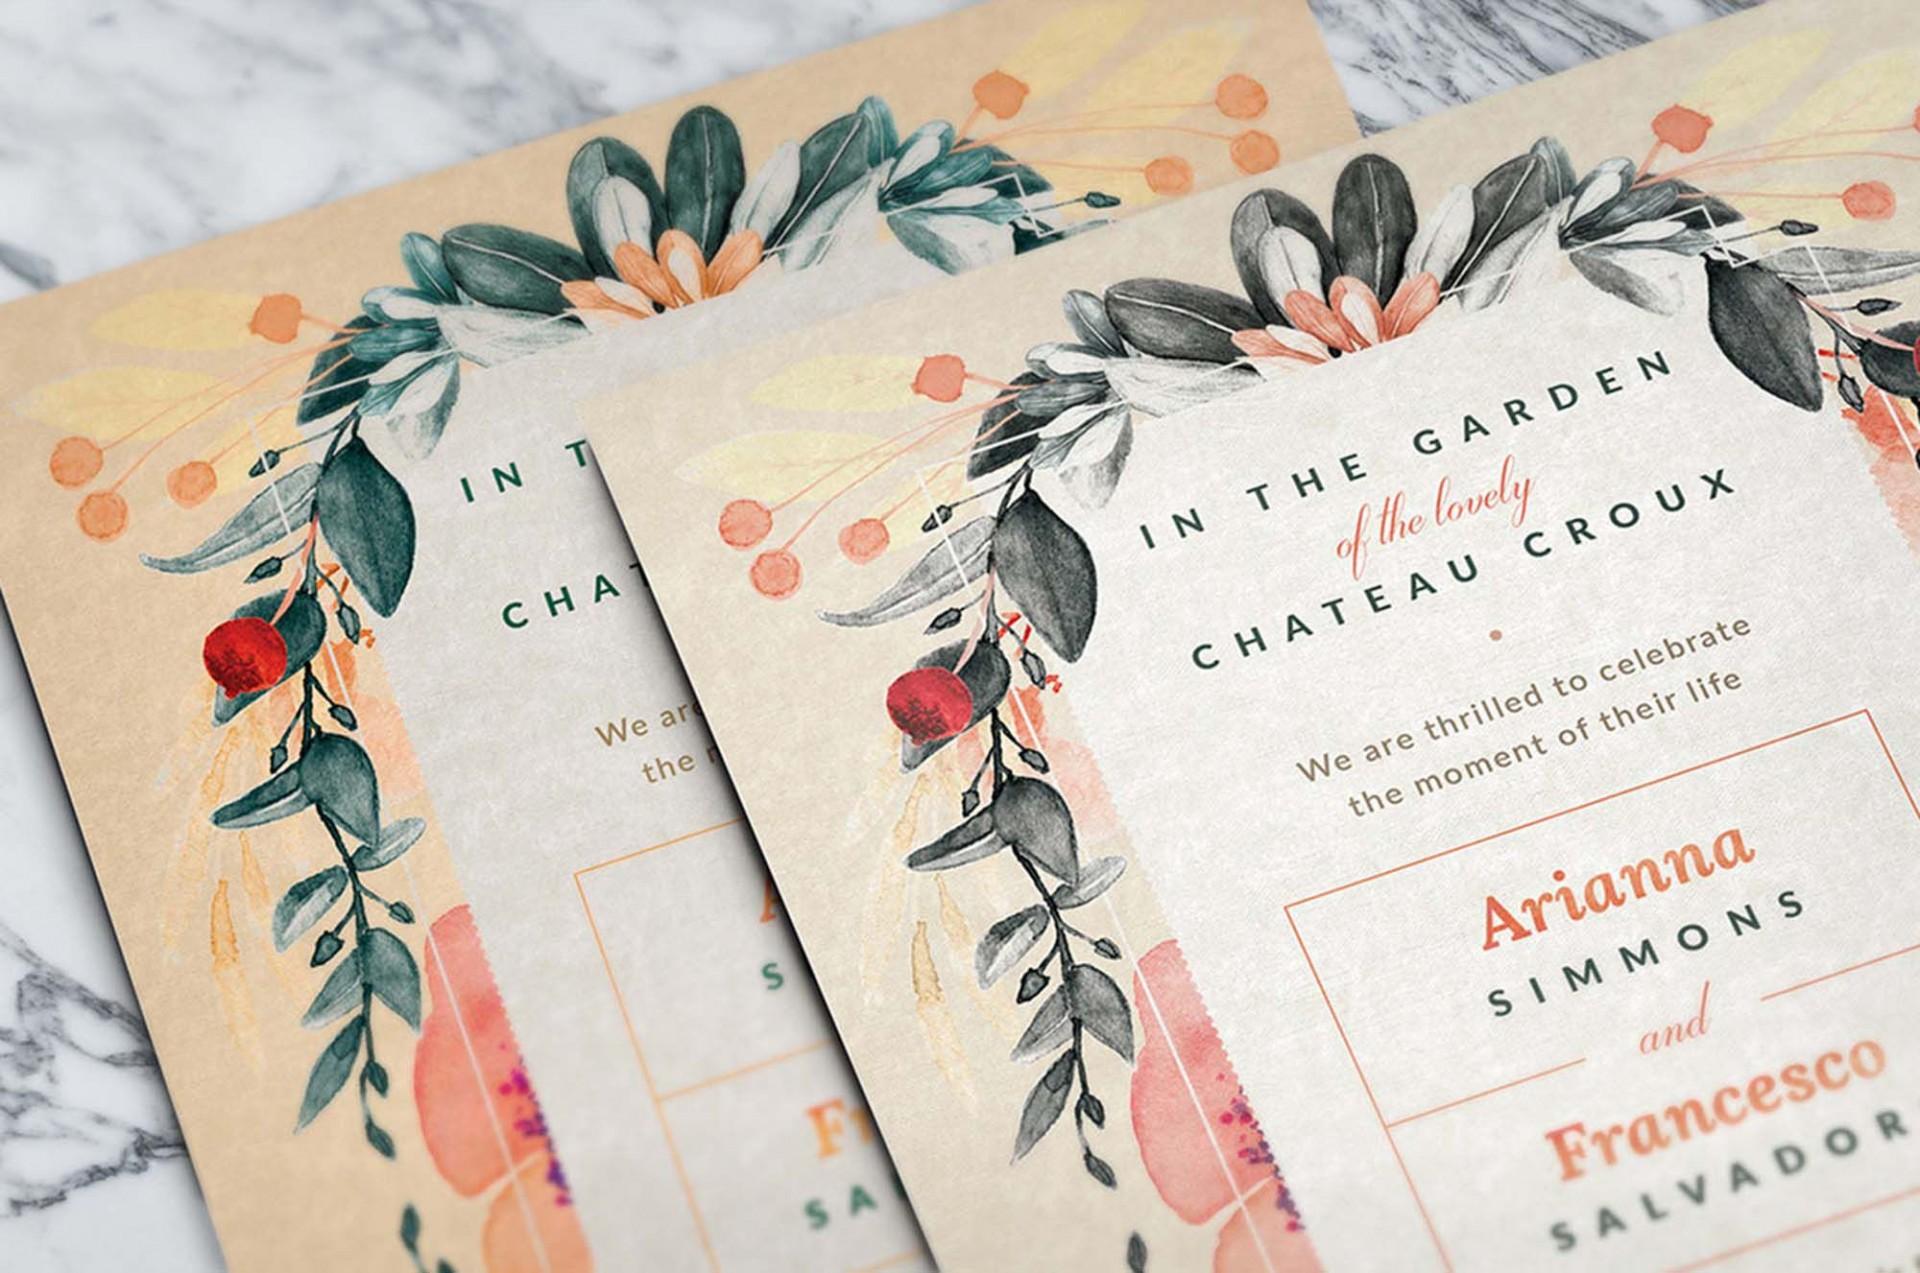 003 Phenomenal Photoshop Wedding Invitation Template Idea  Templates Hindu Psd Free Download Card1920